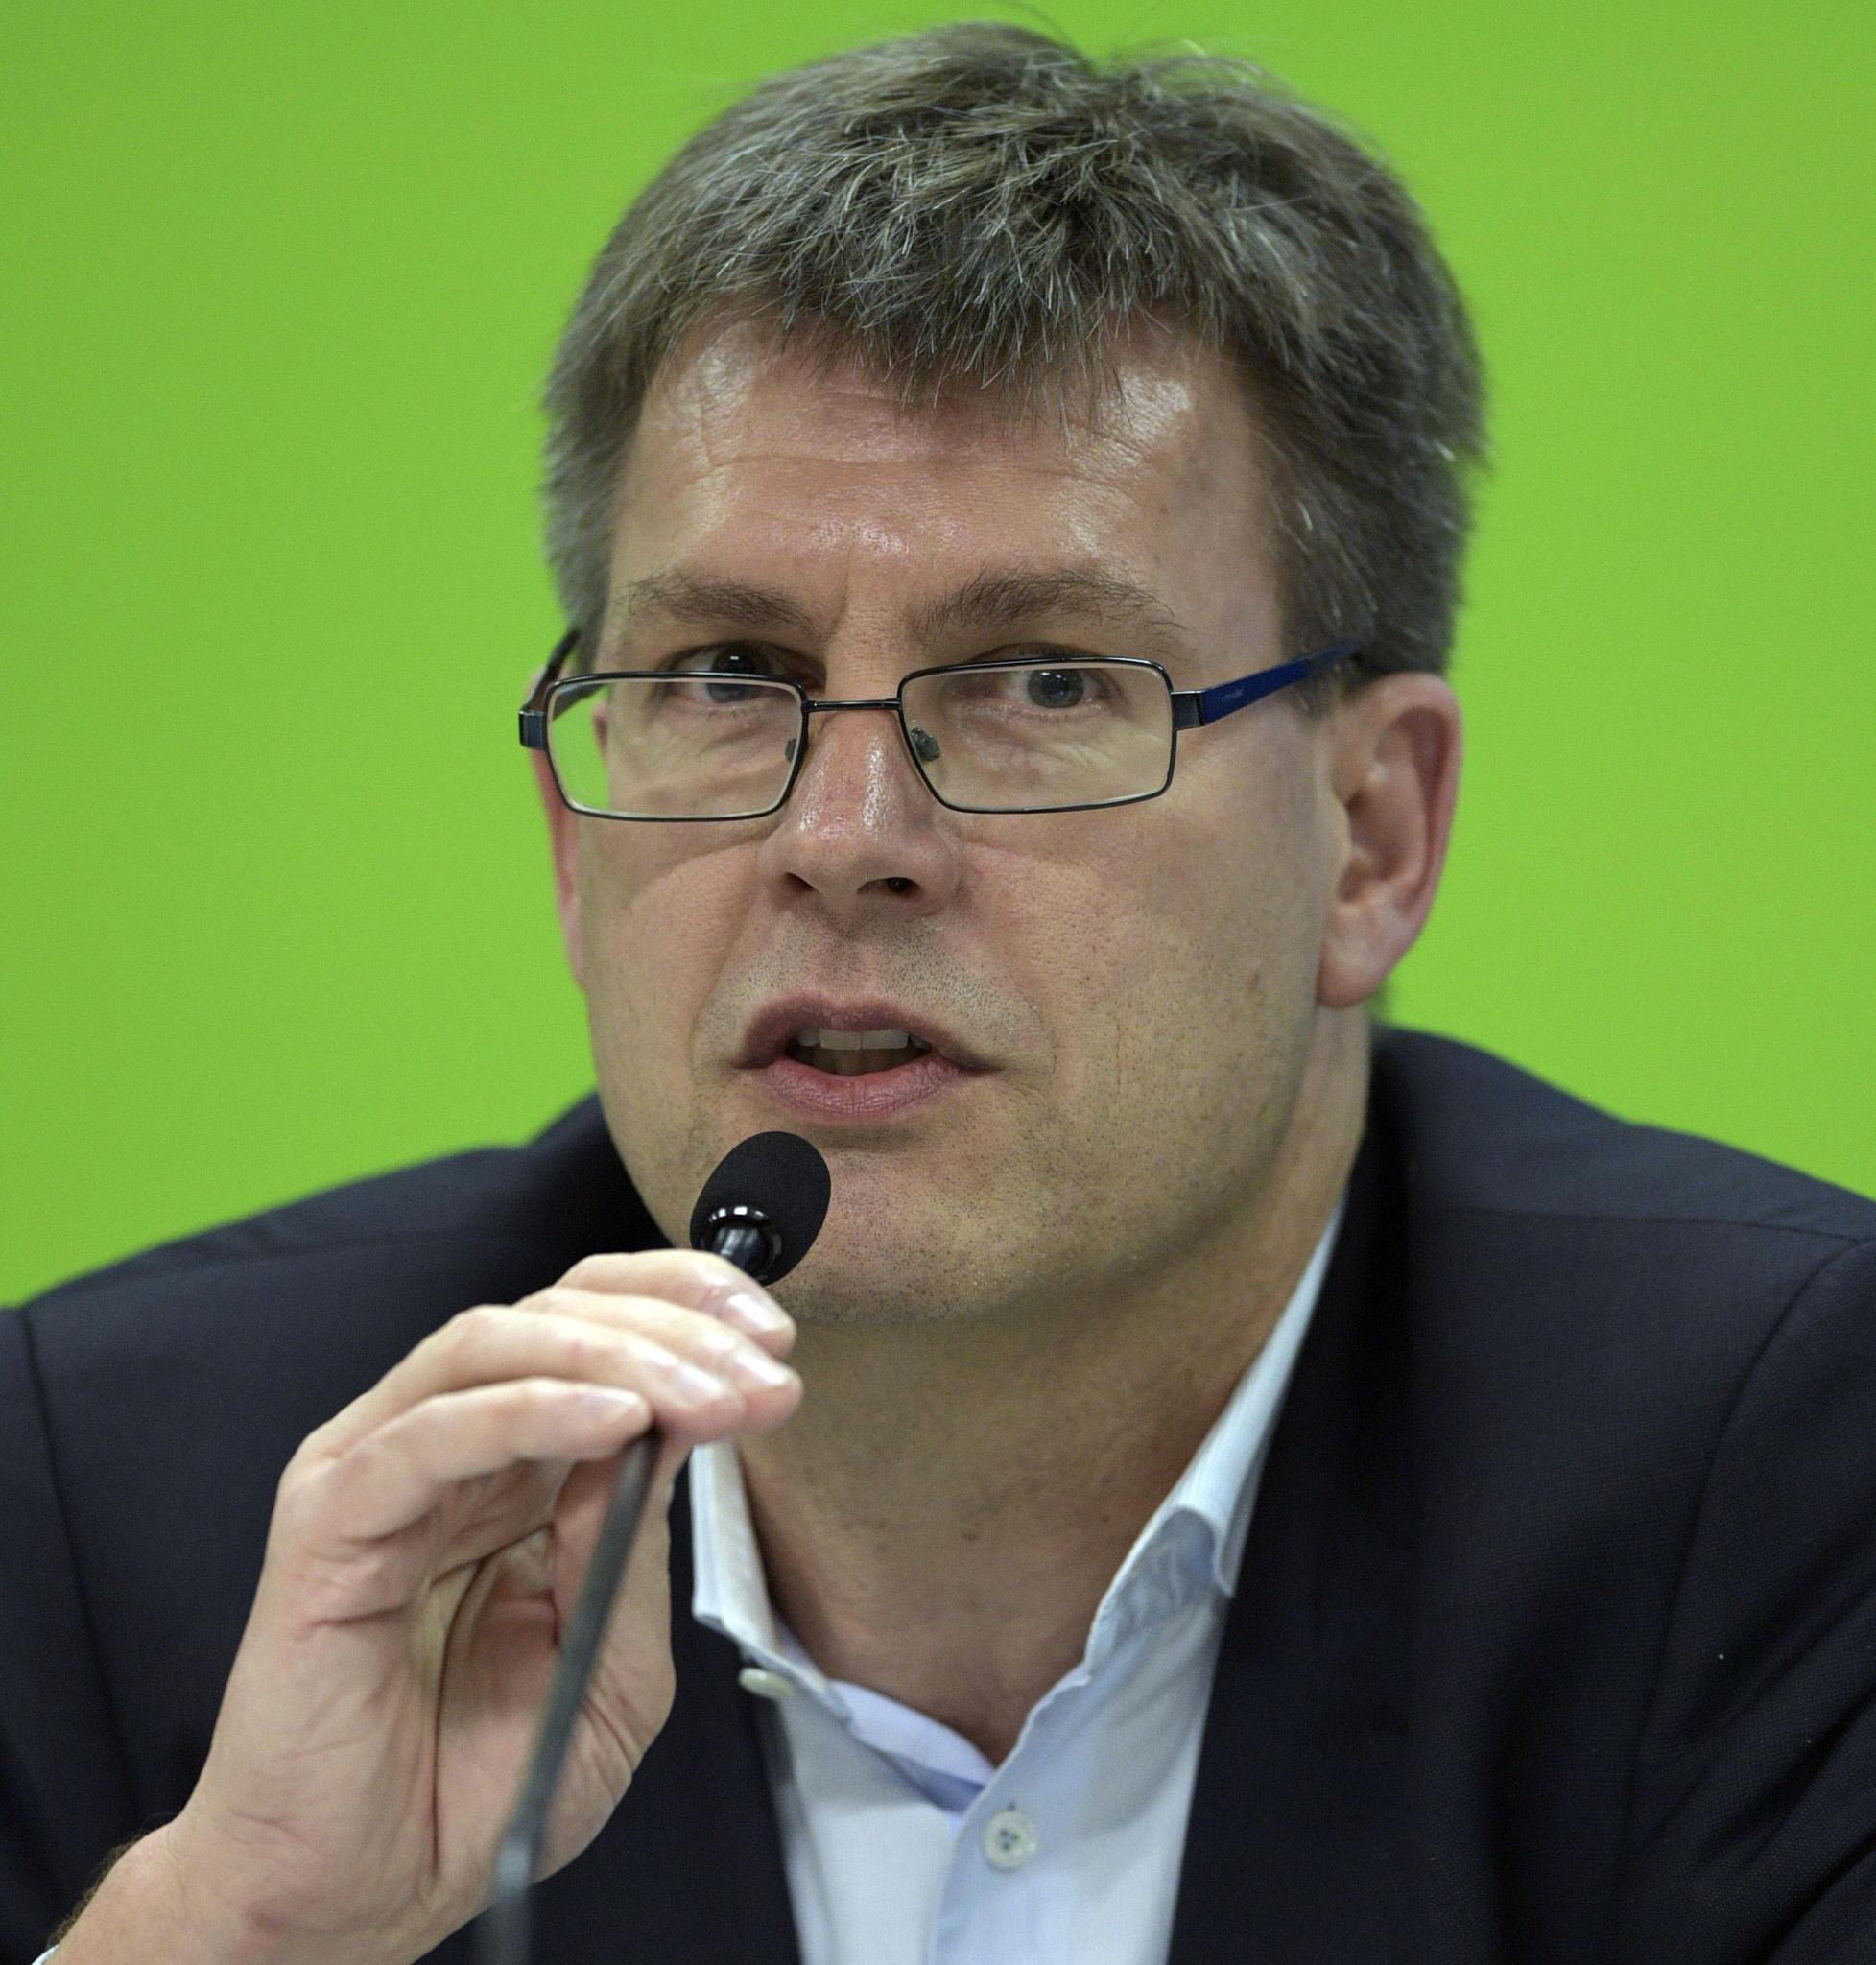 ITTF disputes Weikert interpretation of tribunal order in Deputy President dispute